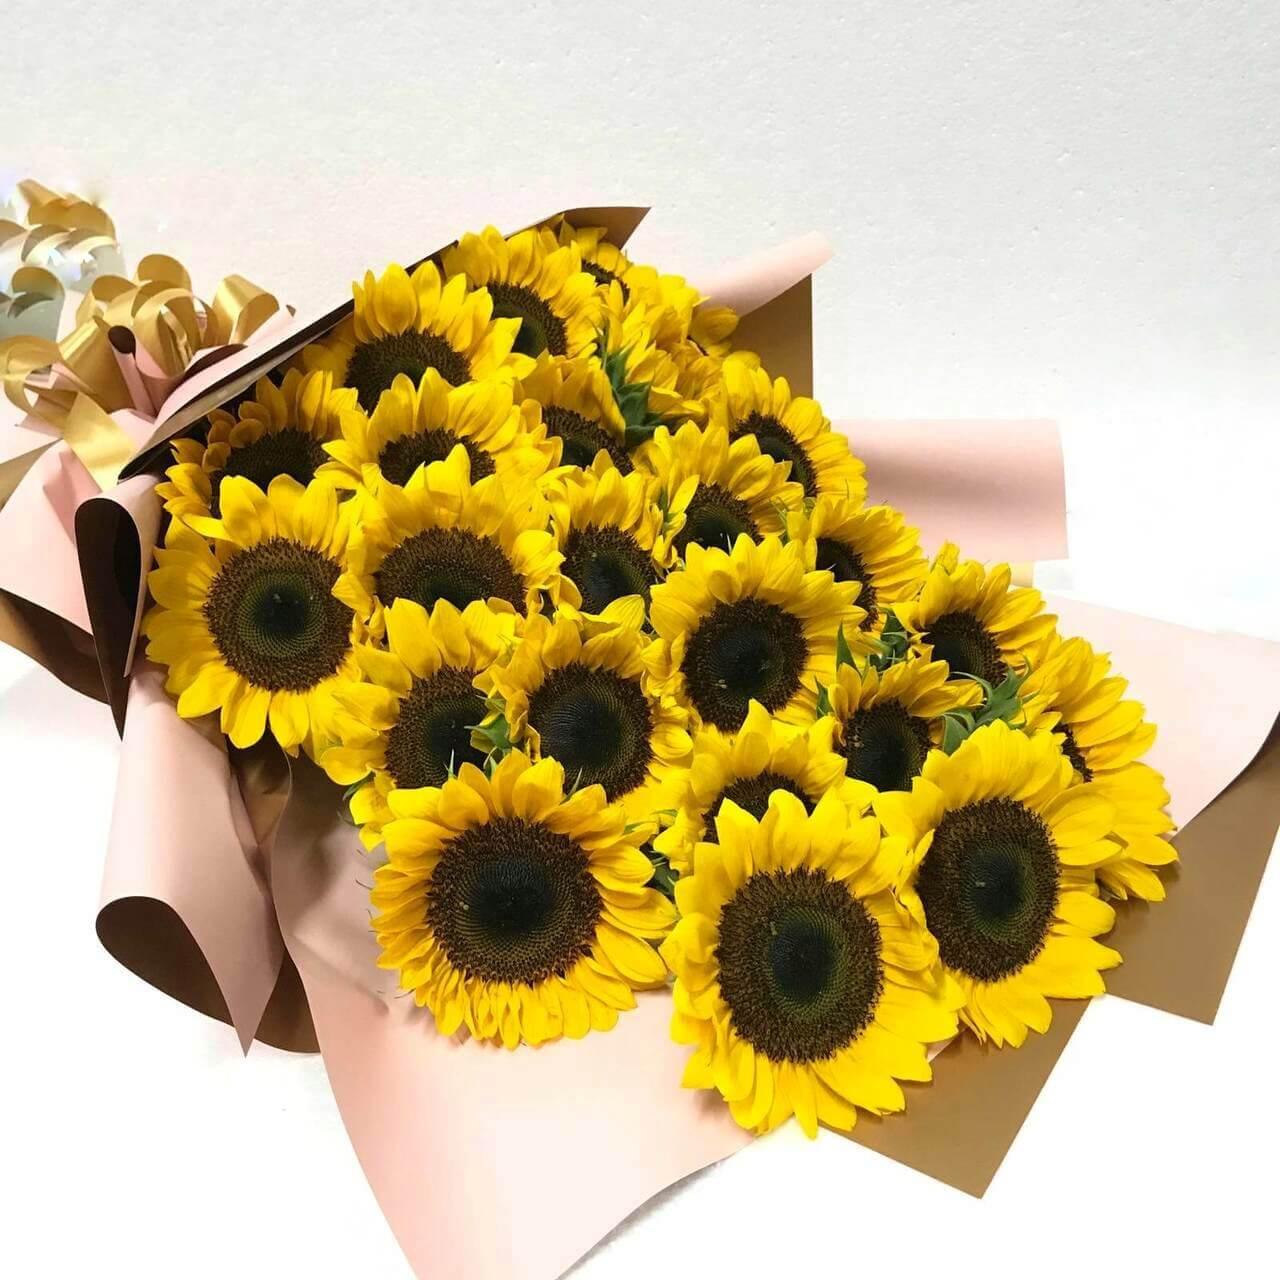 24 Sunflowers Giant Bouquet